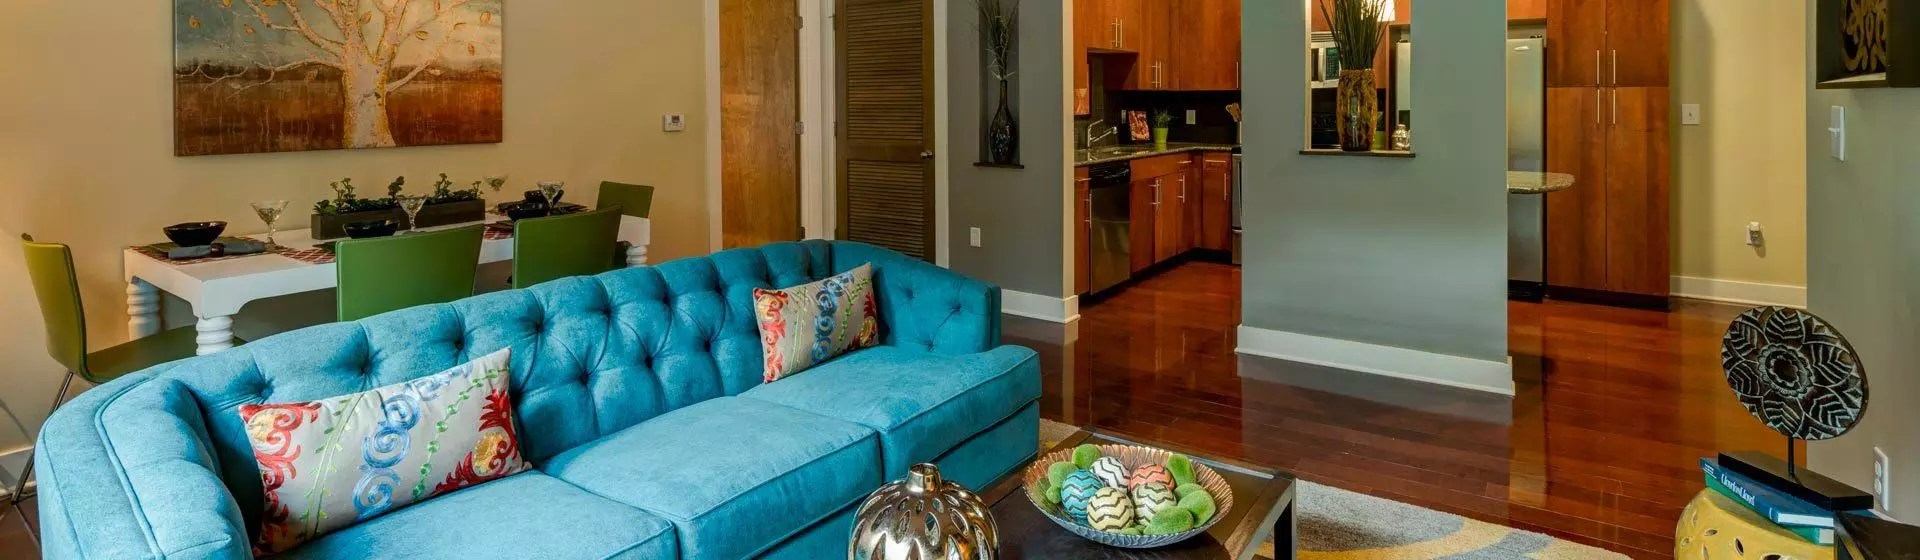 luxury 1 & 2 bedroom apartments in atlanta, ga | eon at lindbergh